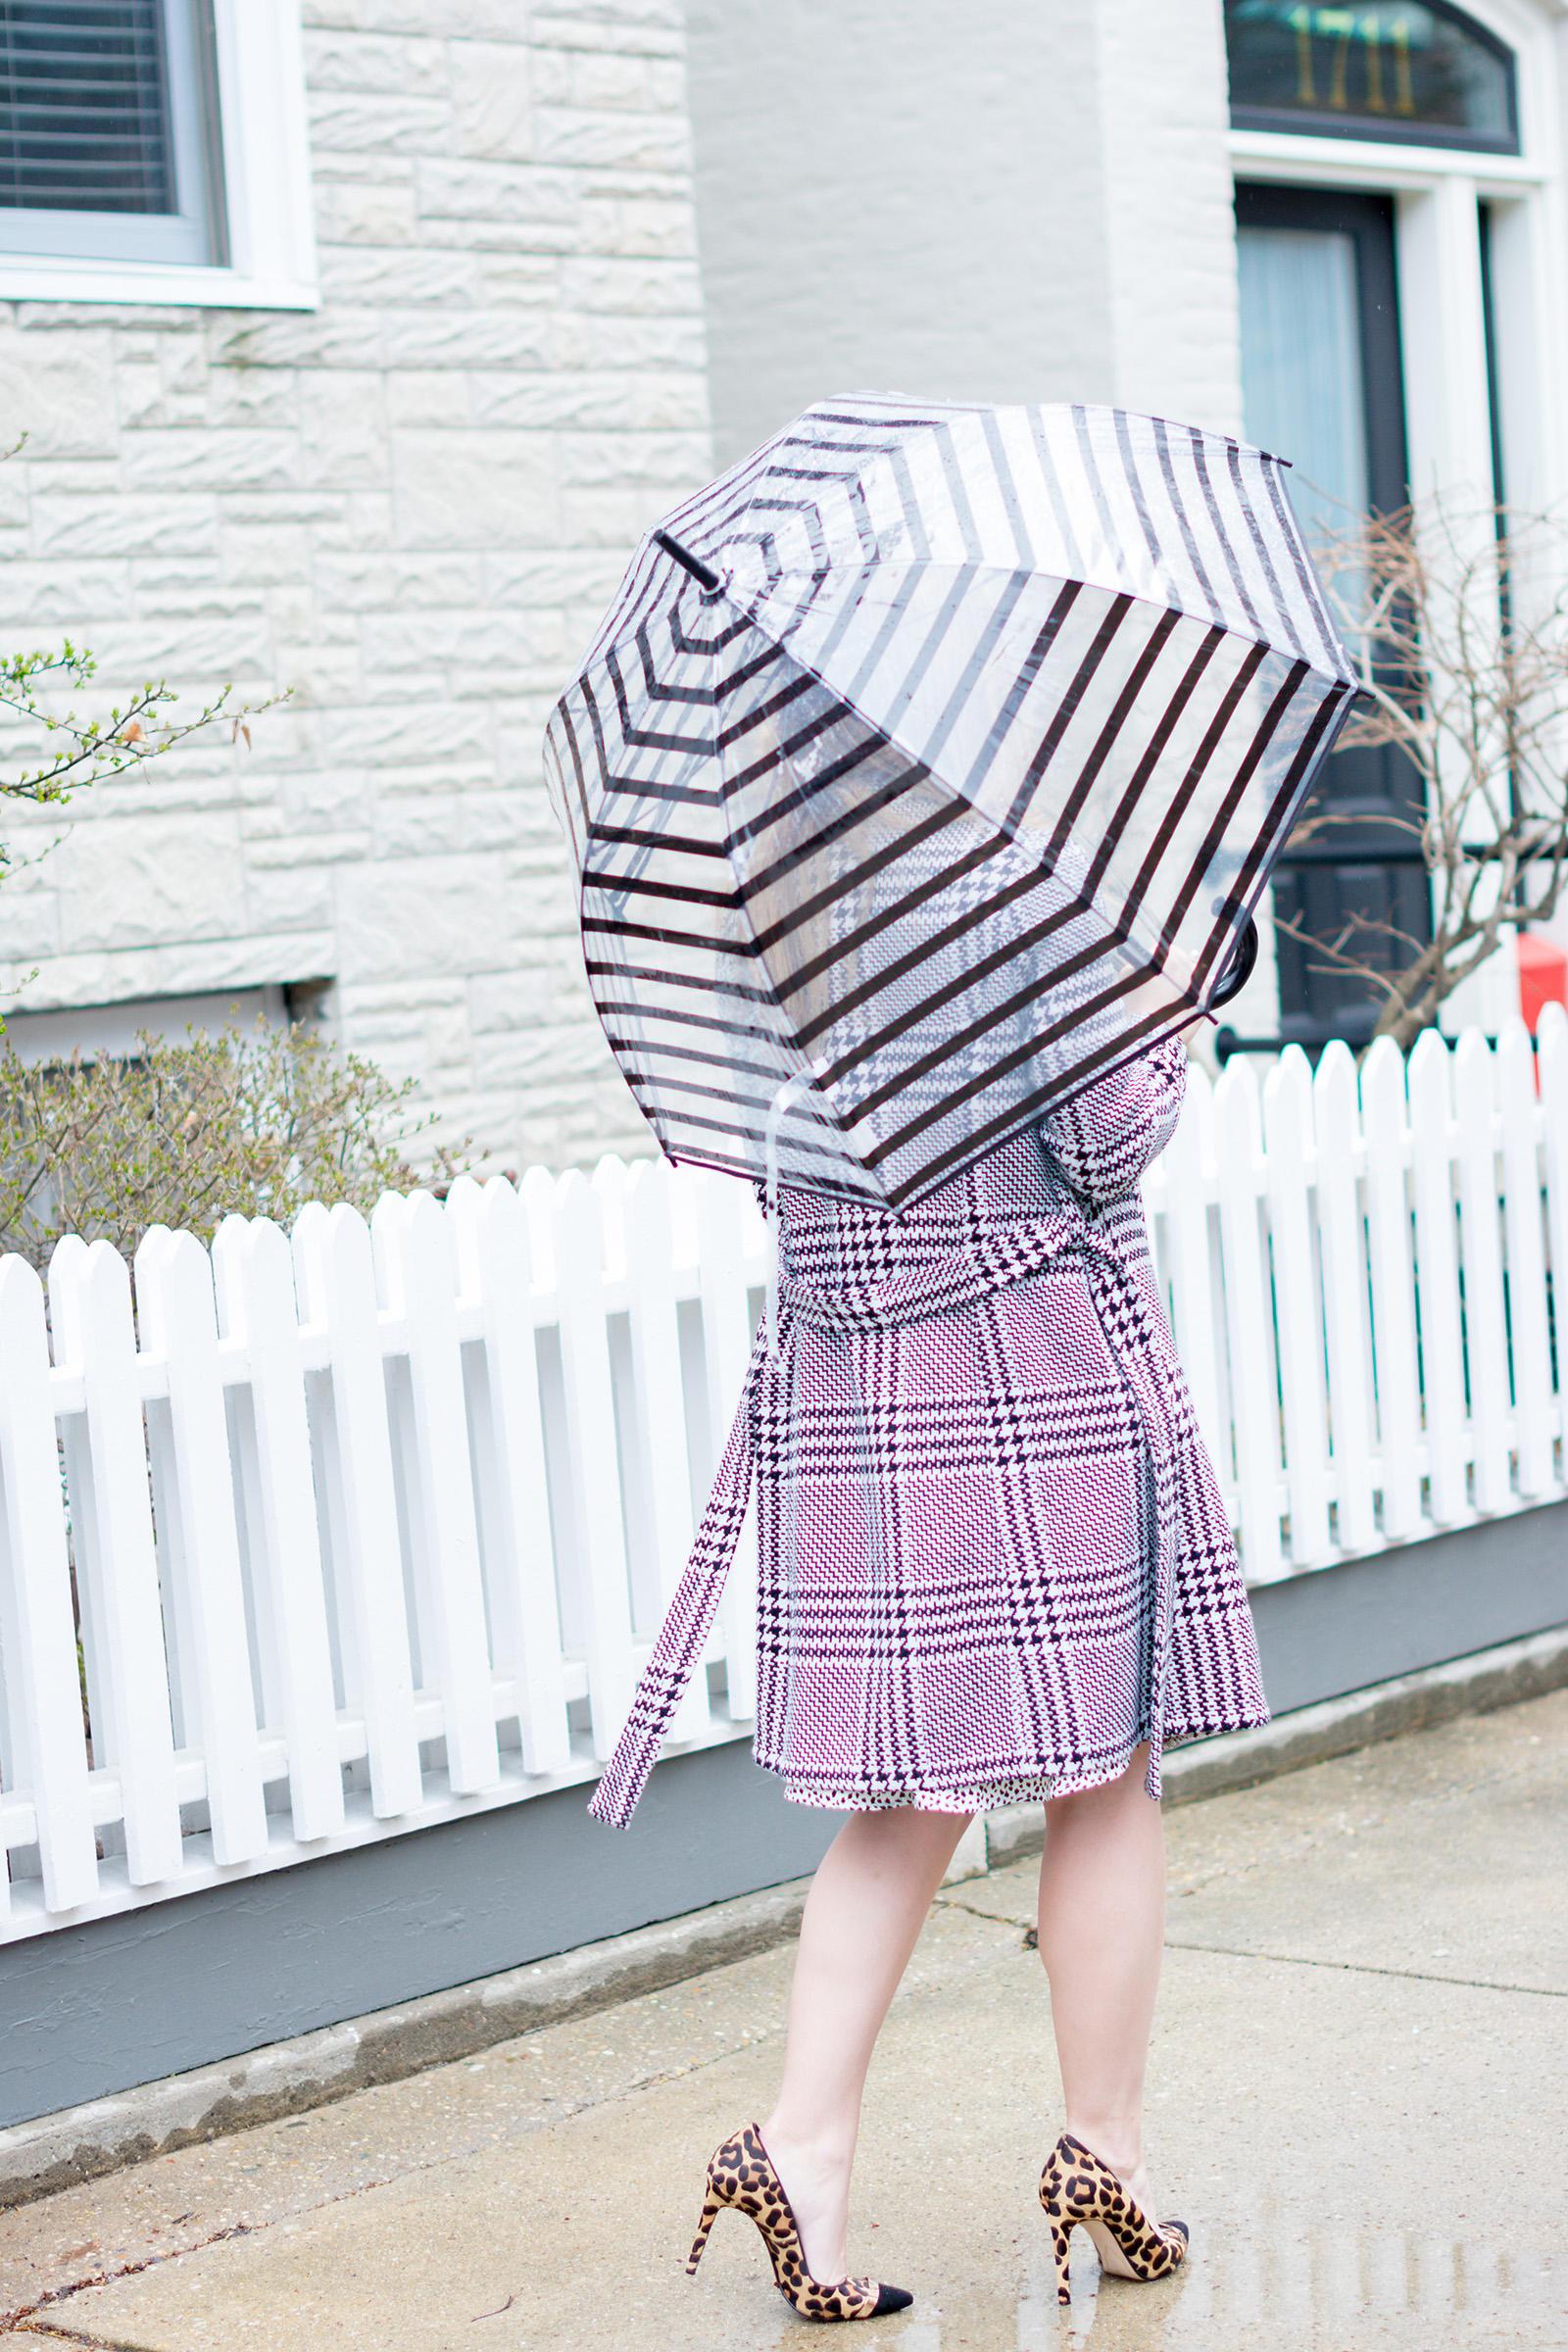 April Showers Outfit Stripes-42891